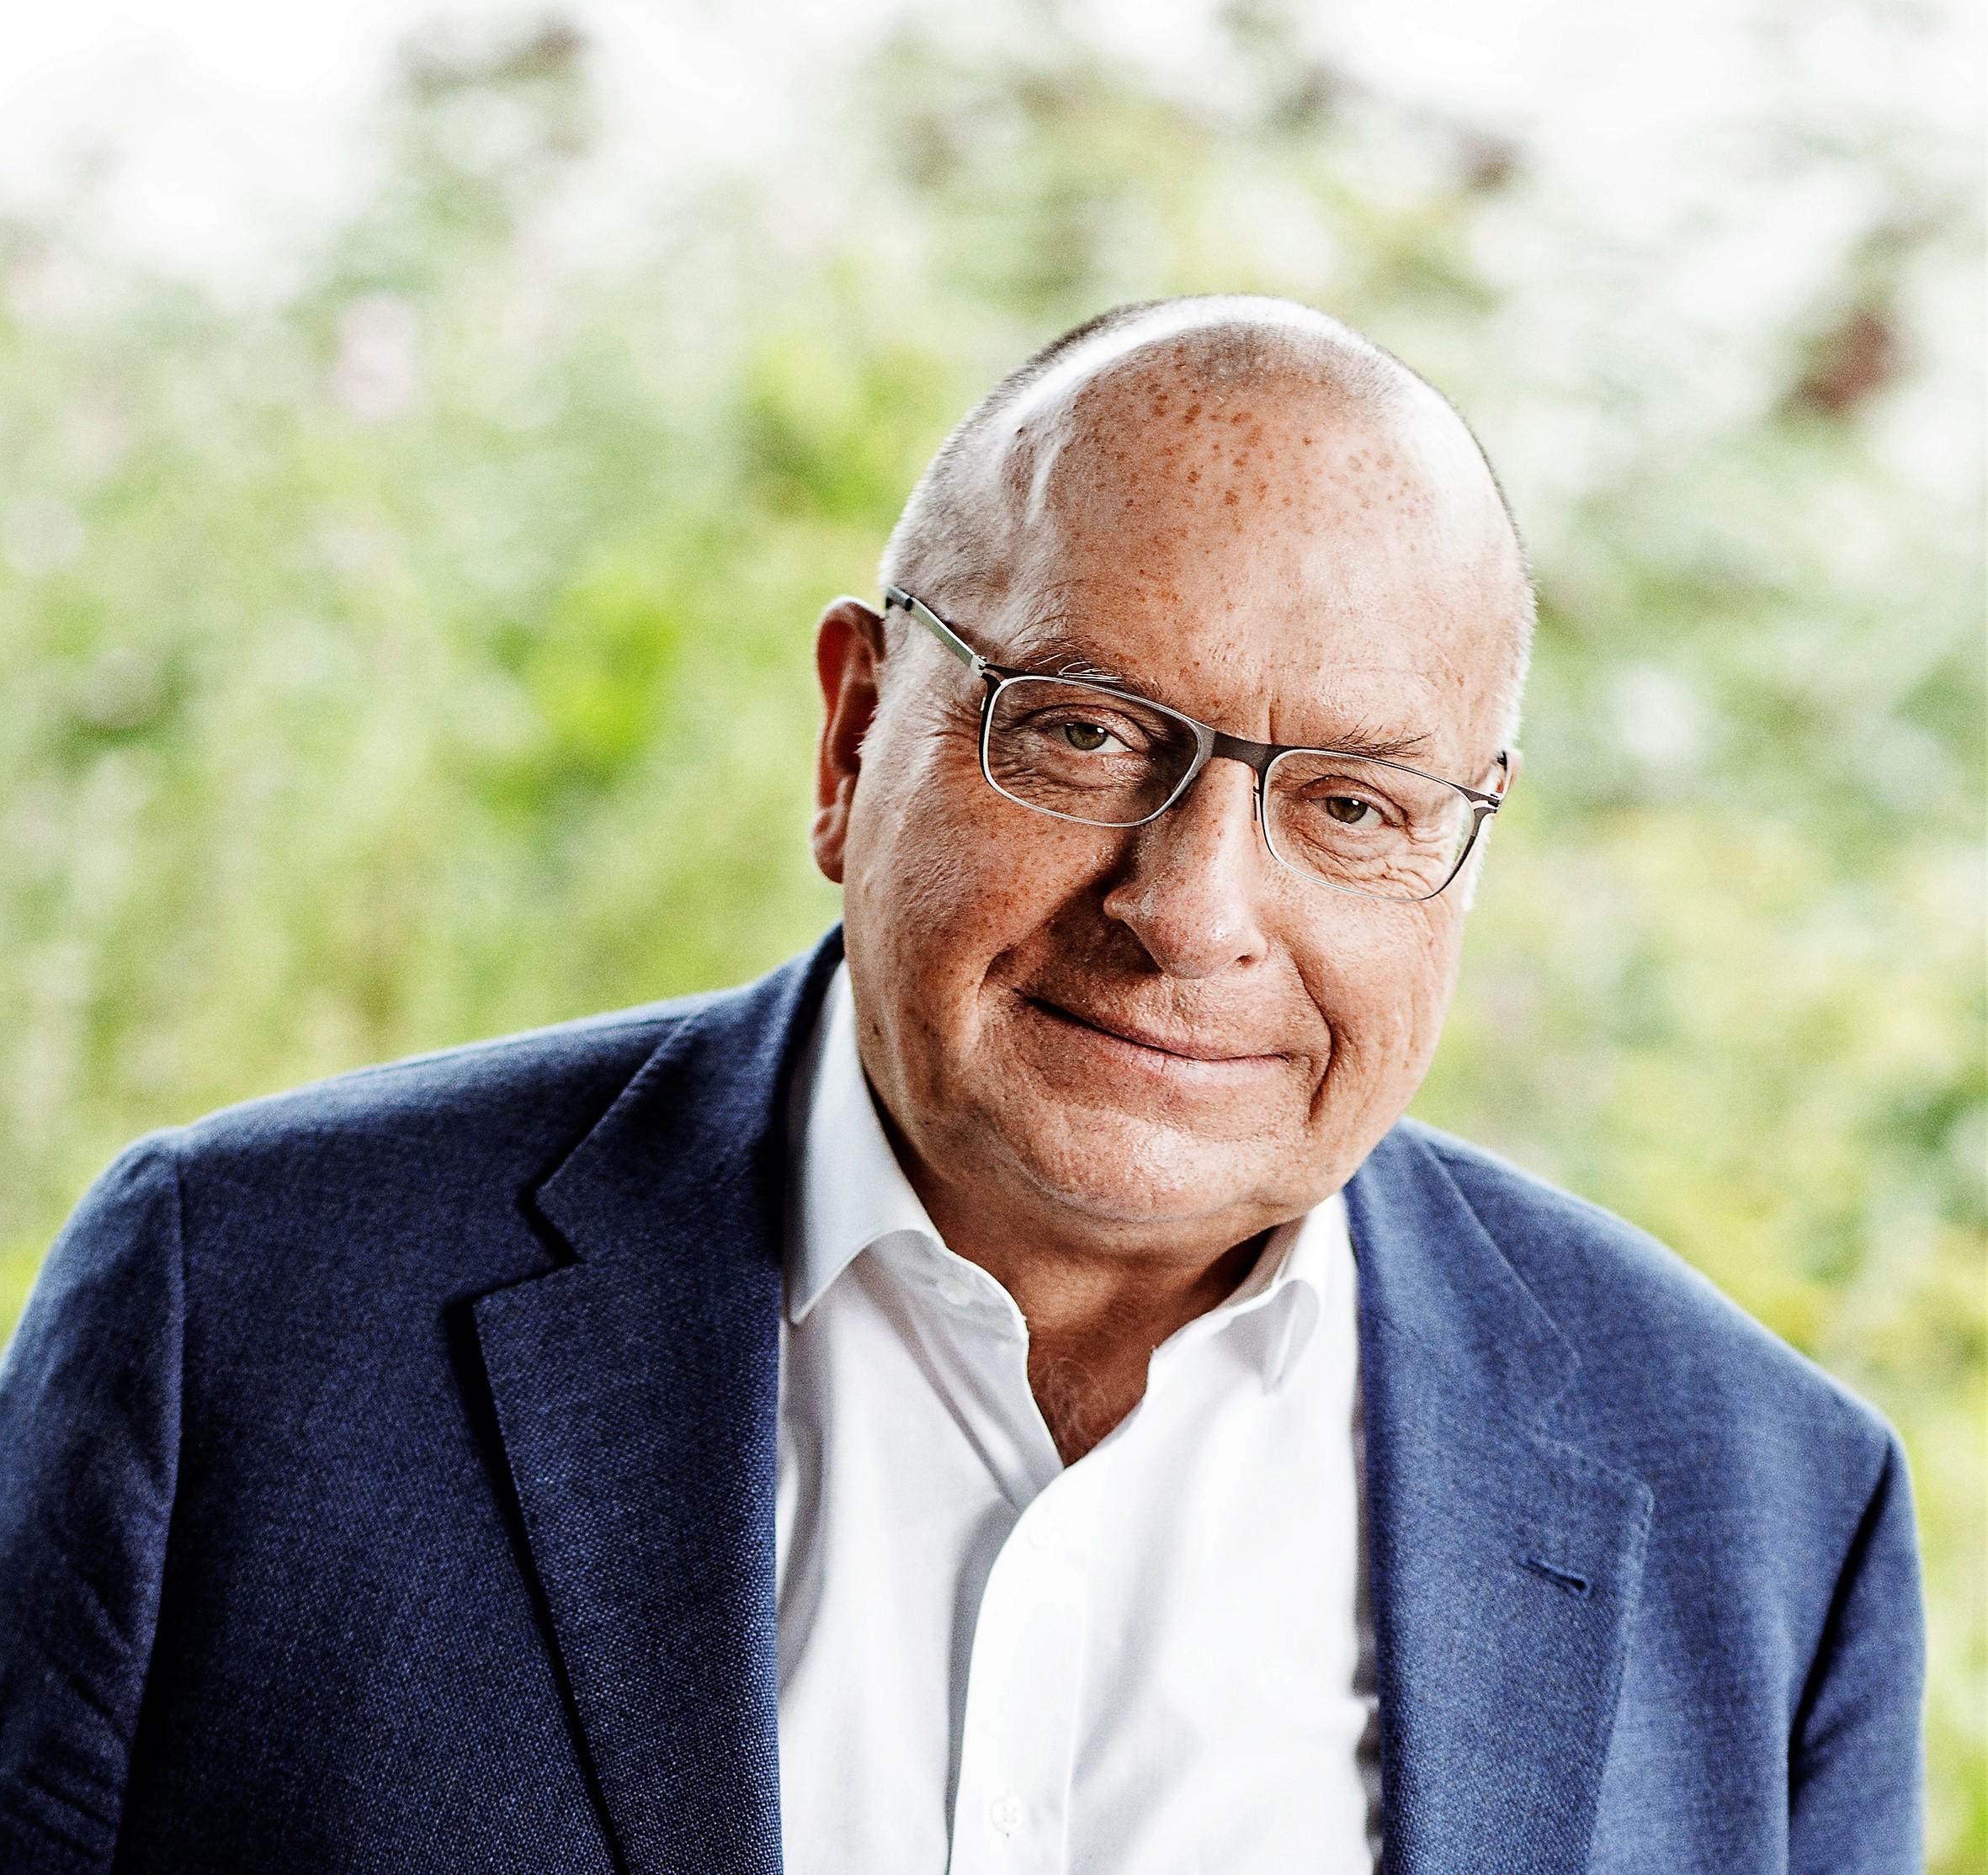 Den danske hoteldirektør Jens Zimmer Christensen er fra årsskiftet ny formand for den fælleseuropæiske hotel- og restaurantorganisation, HOTREC. Foto: Horesta.